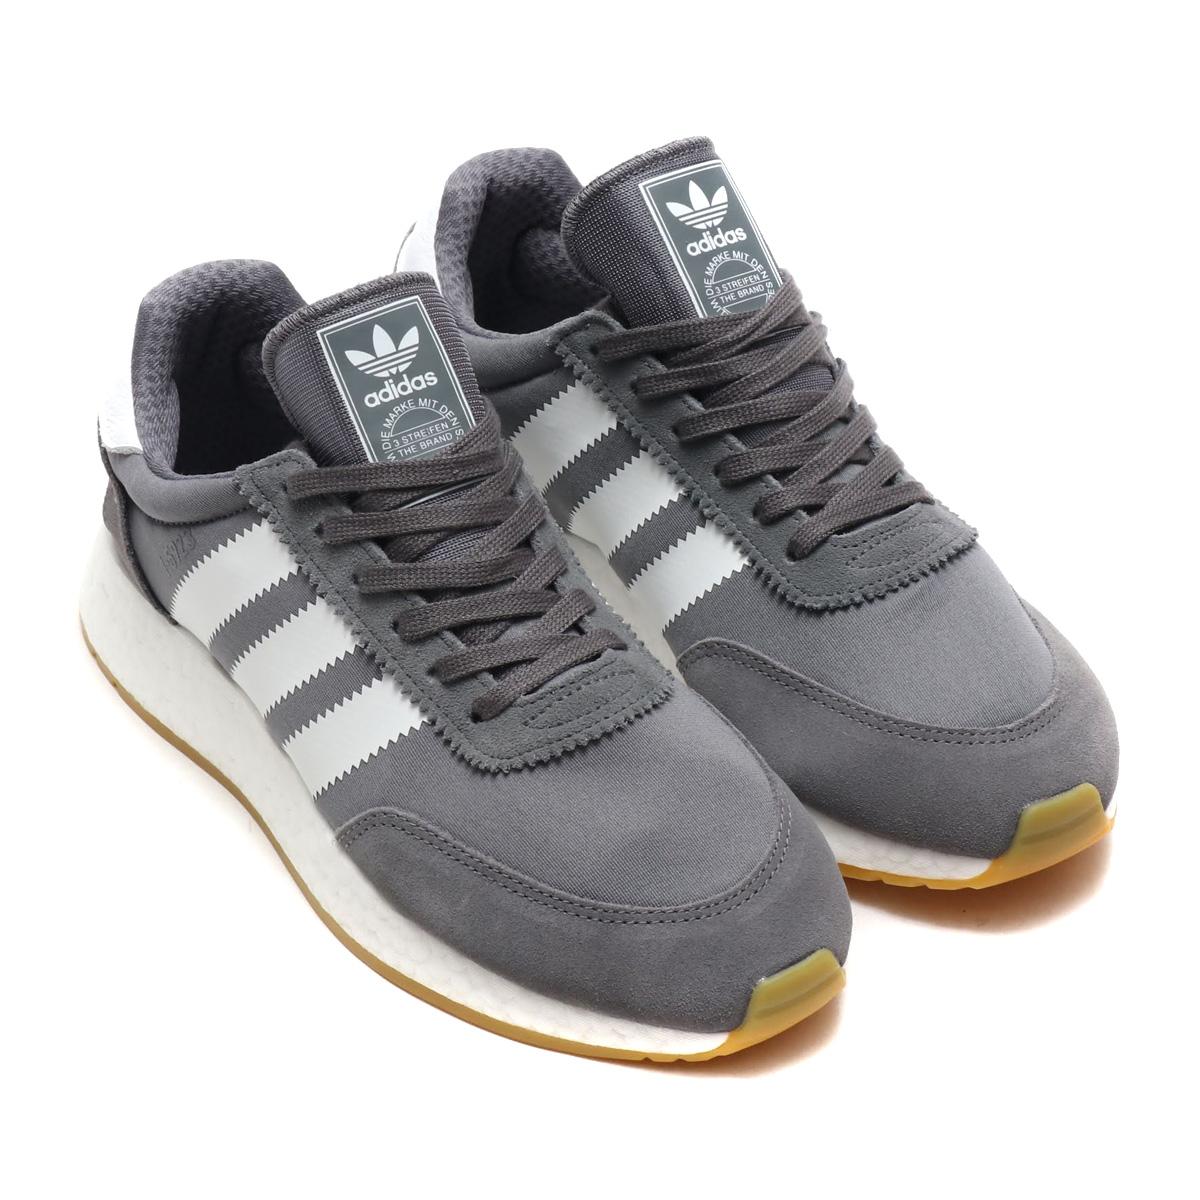 adidas Originals I-5923(アディダス オリジナルス I-5923)Grey Four/Running White/Gum【メンズ スニーカー】18FW-I